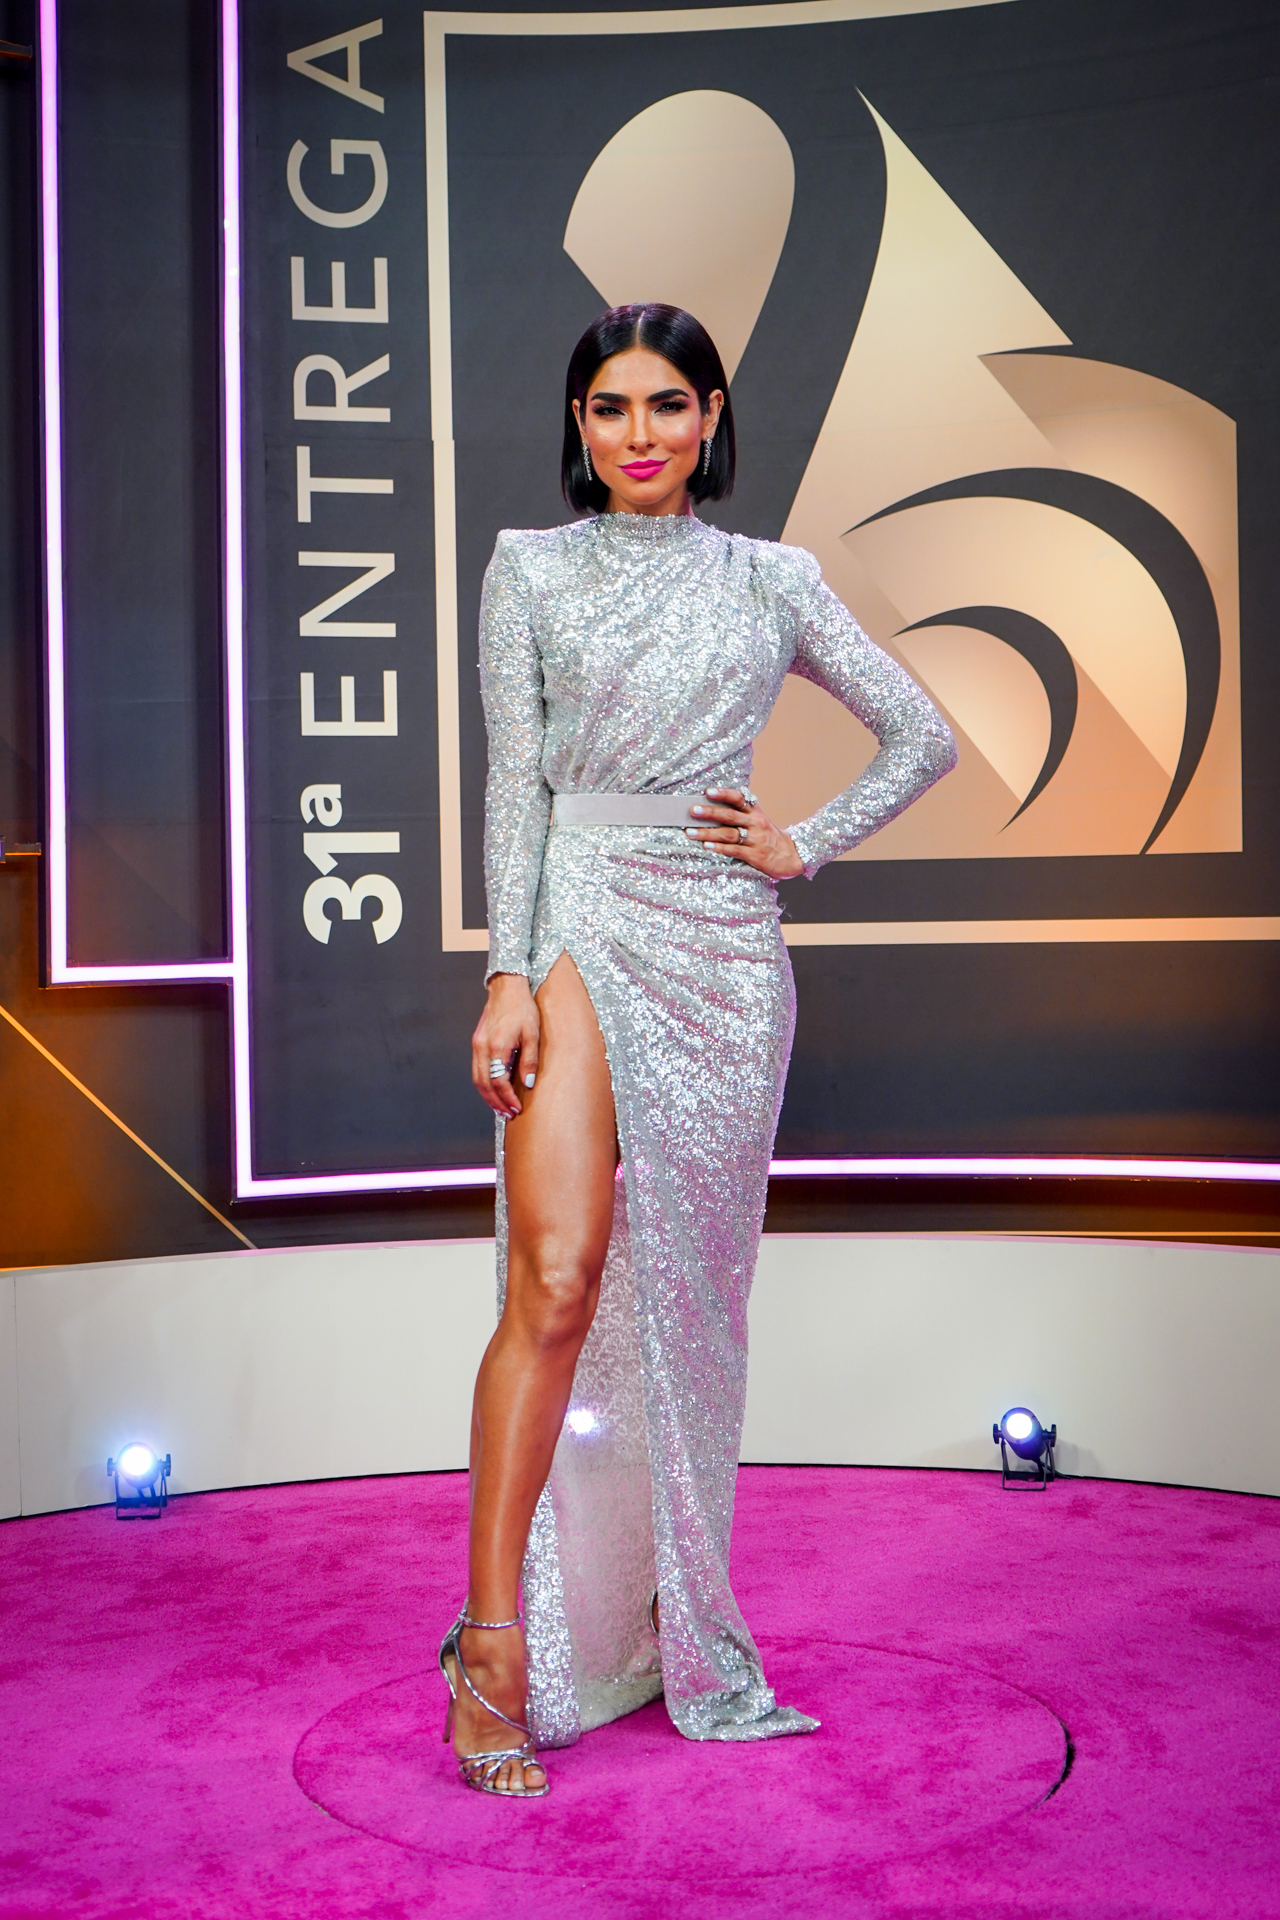 Una de las presentadoras, la modelo mexicana Alejandra Espinoza lució regia como de costumbre. (Suministrada/ Univision)